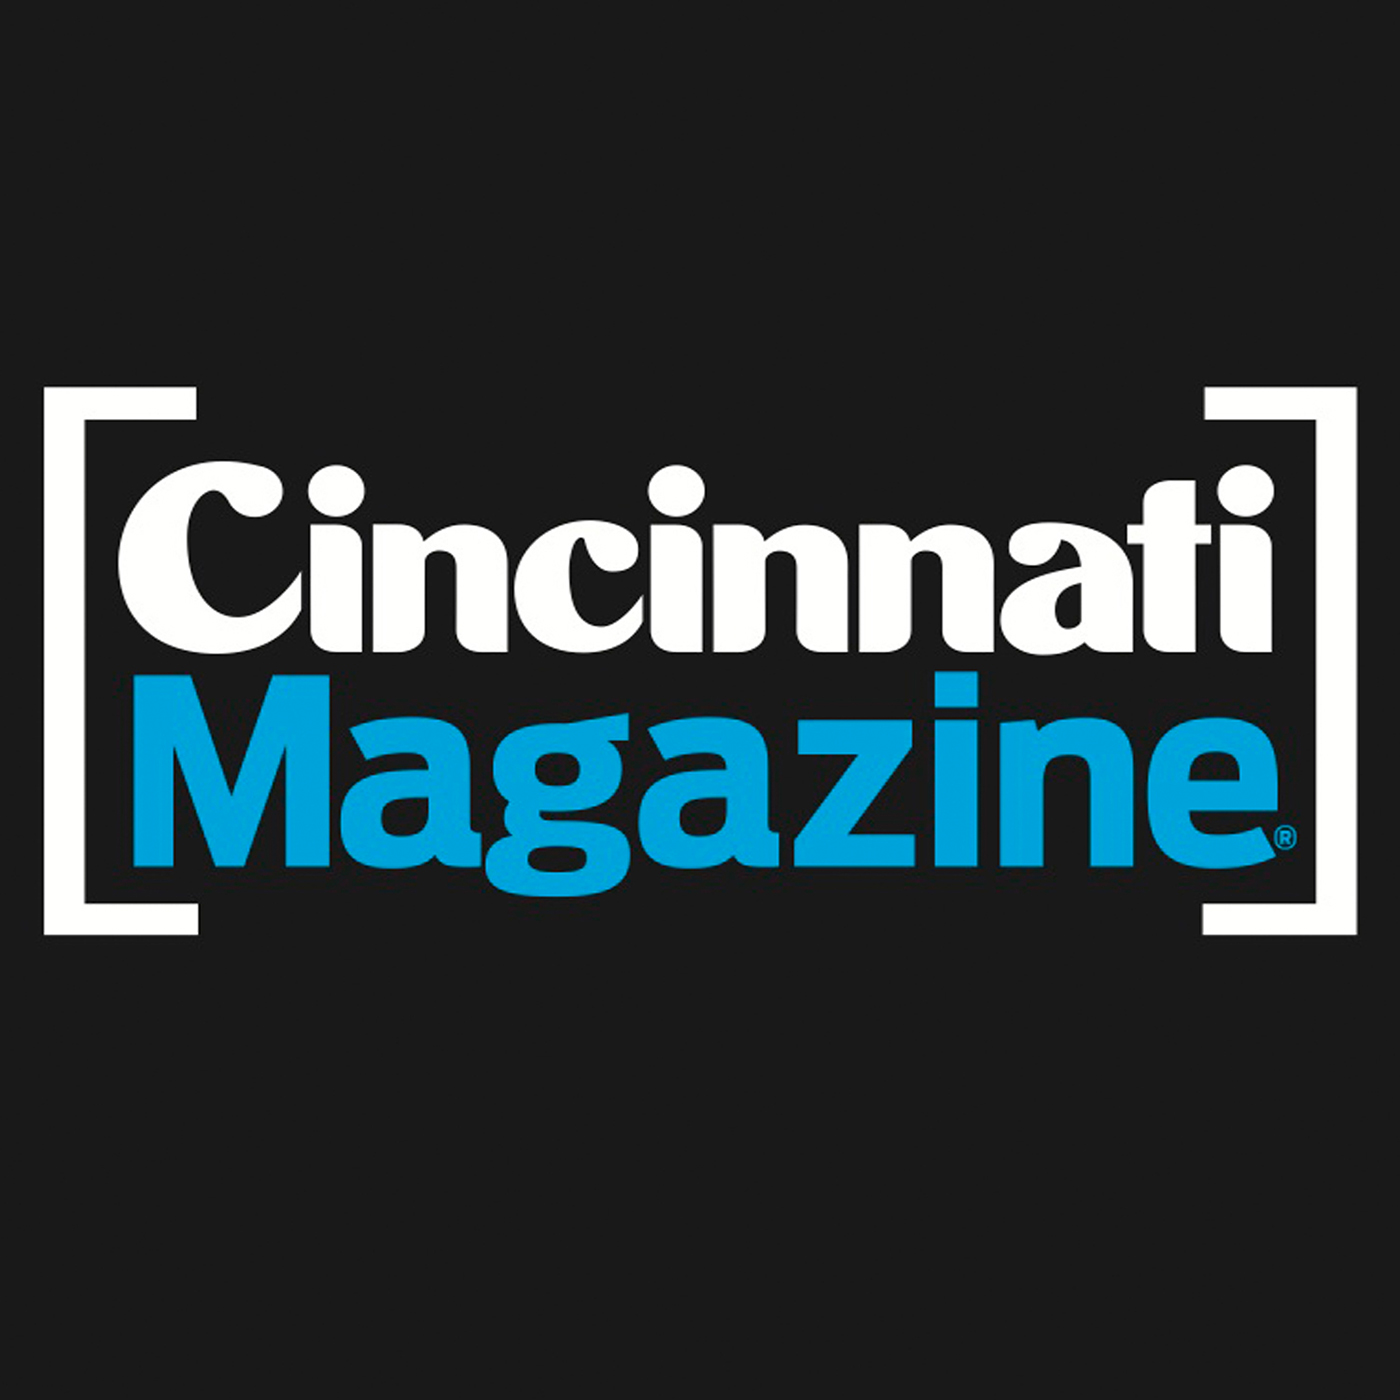 Cincinnati Magazine Podcast show art